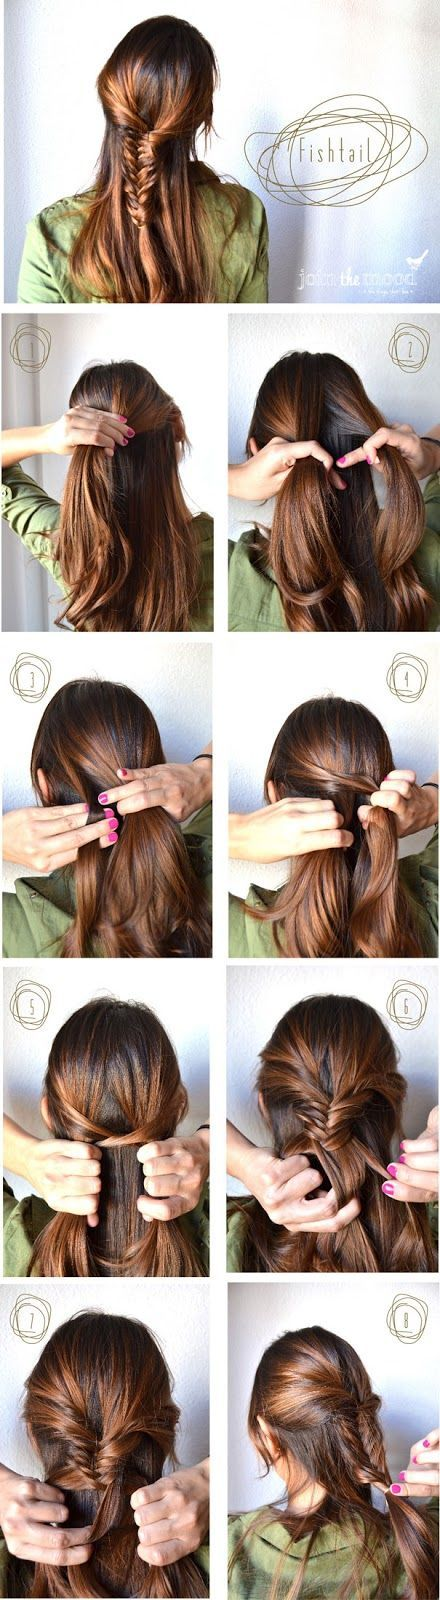 Half-up fishtail braid tutorial for an Elven Archer look